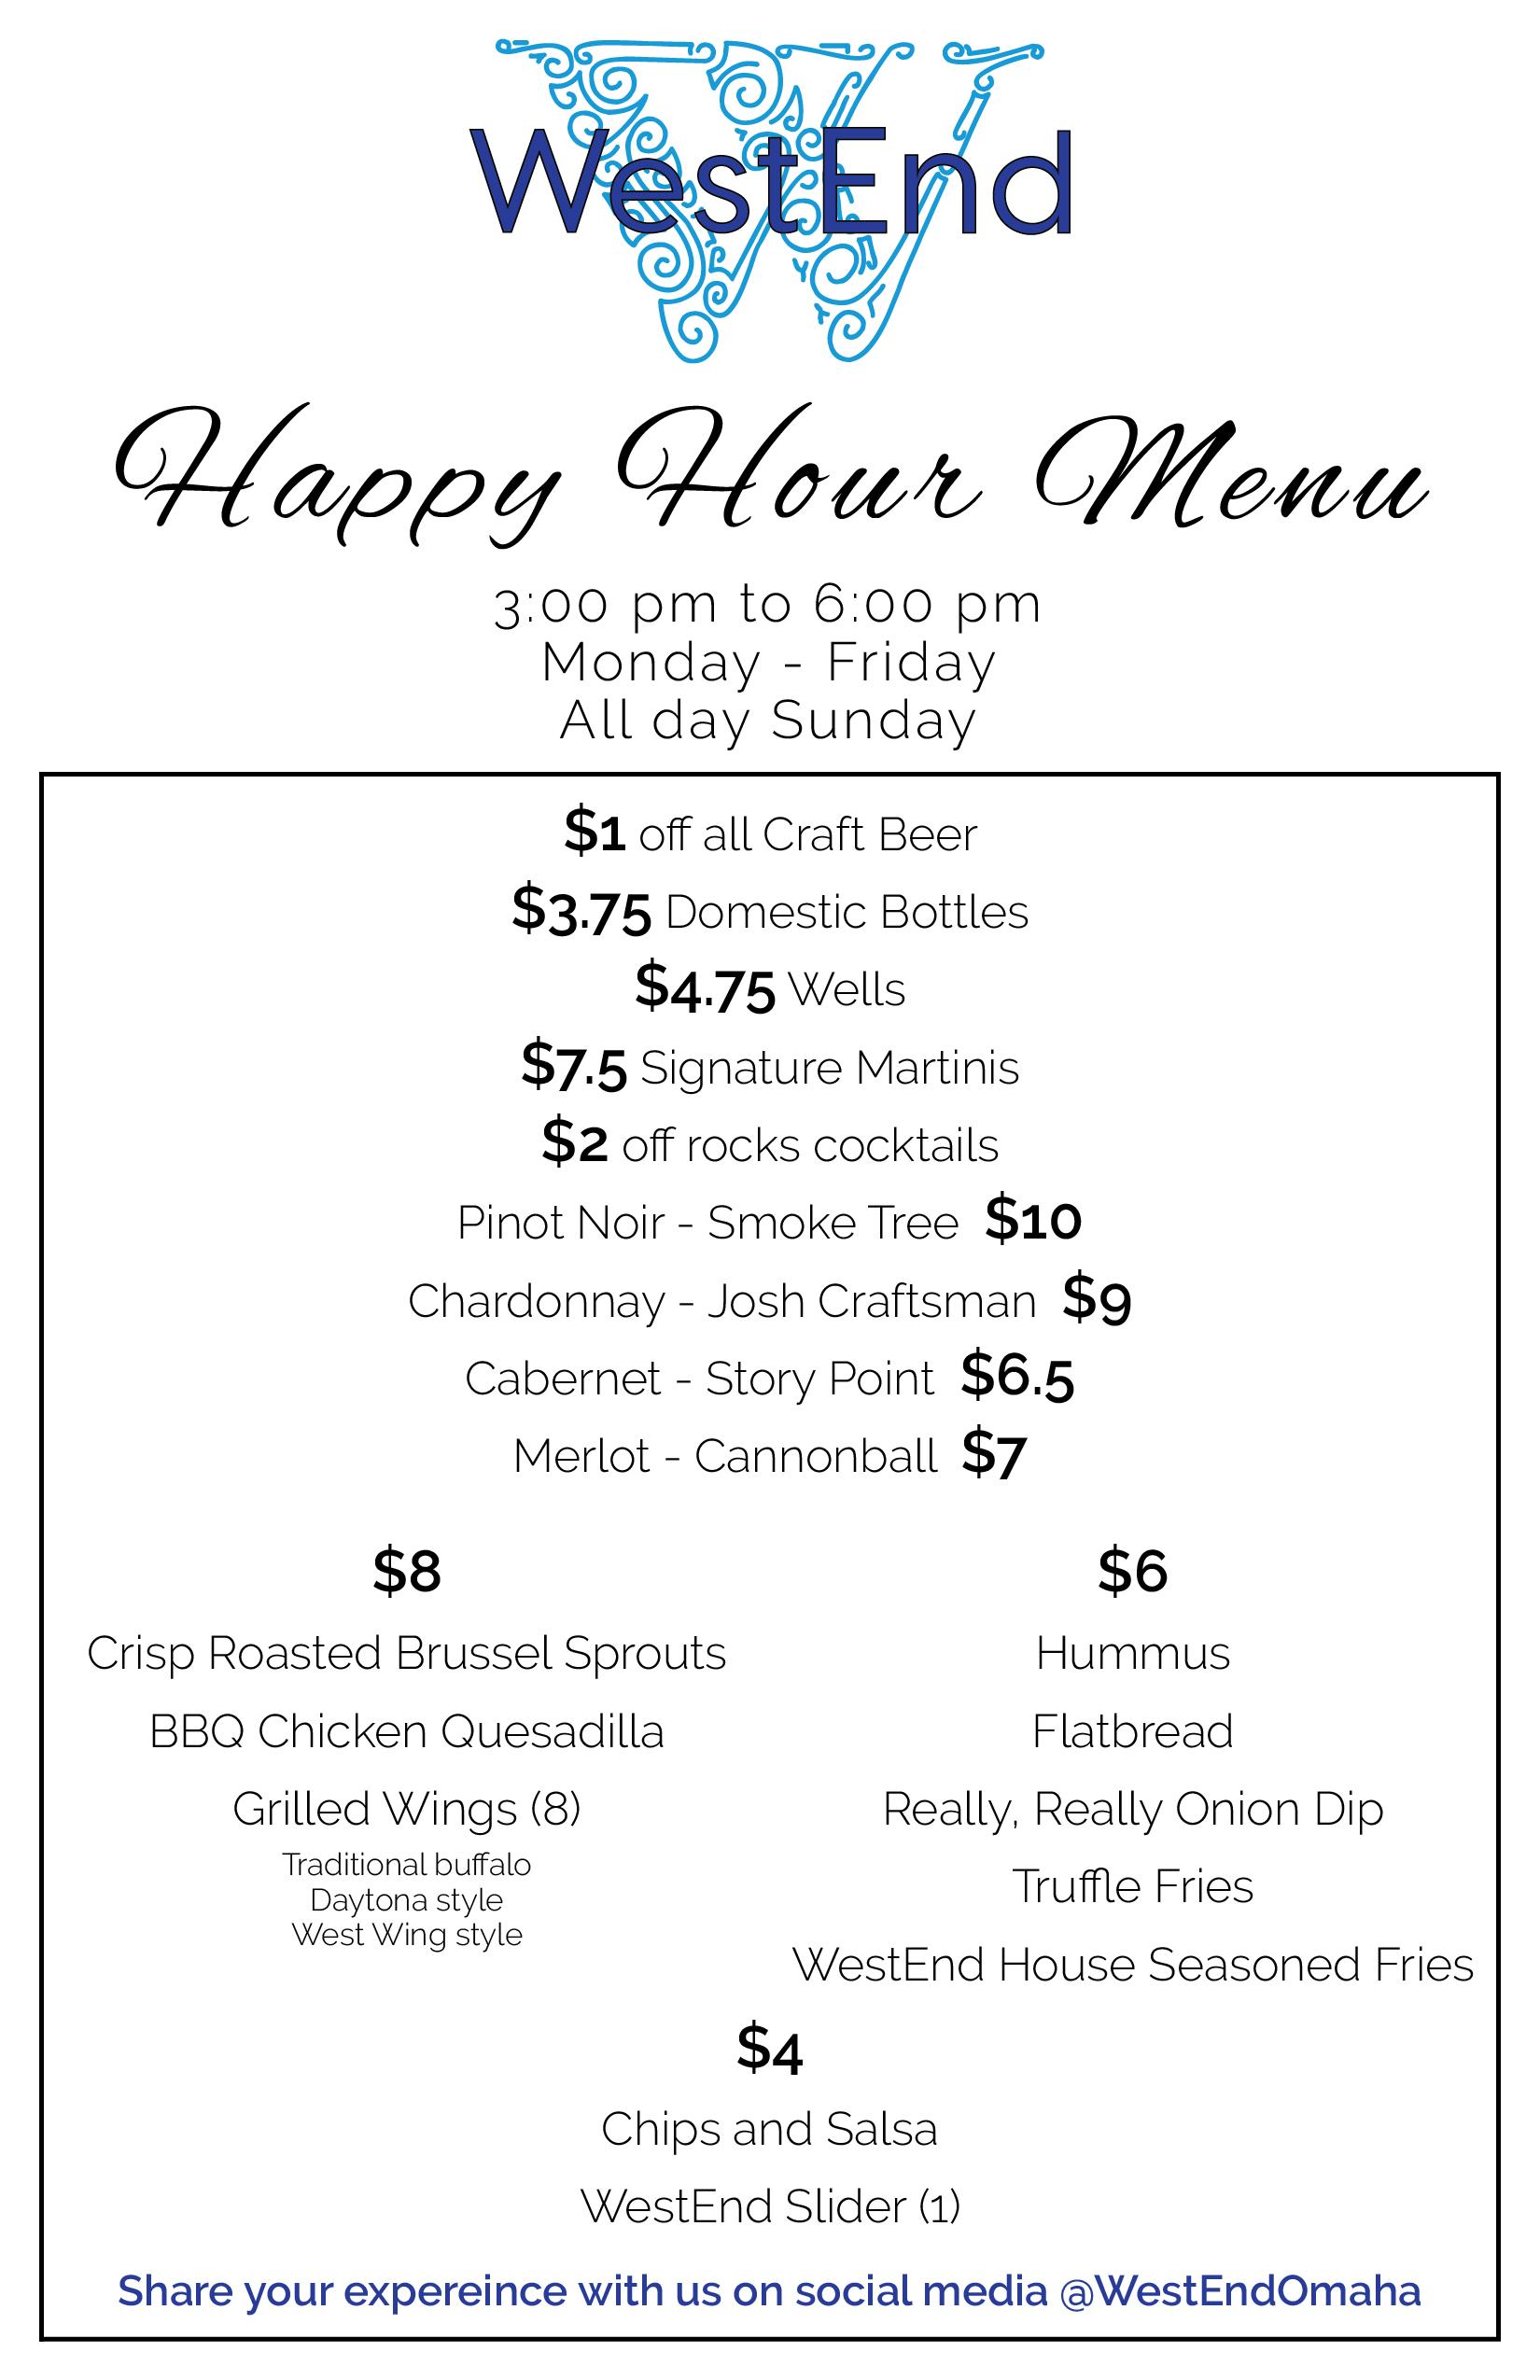 WestEnd Bar Happy Hour Menu